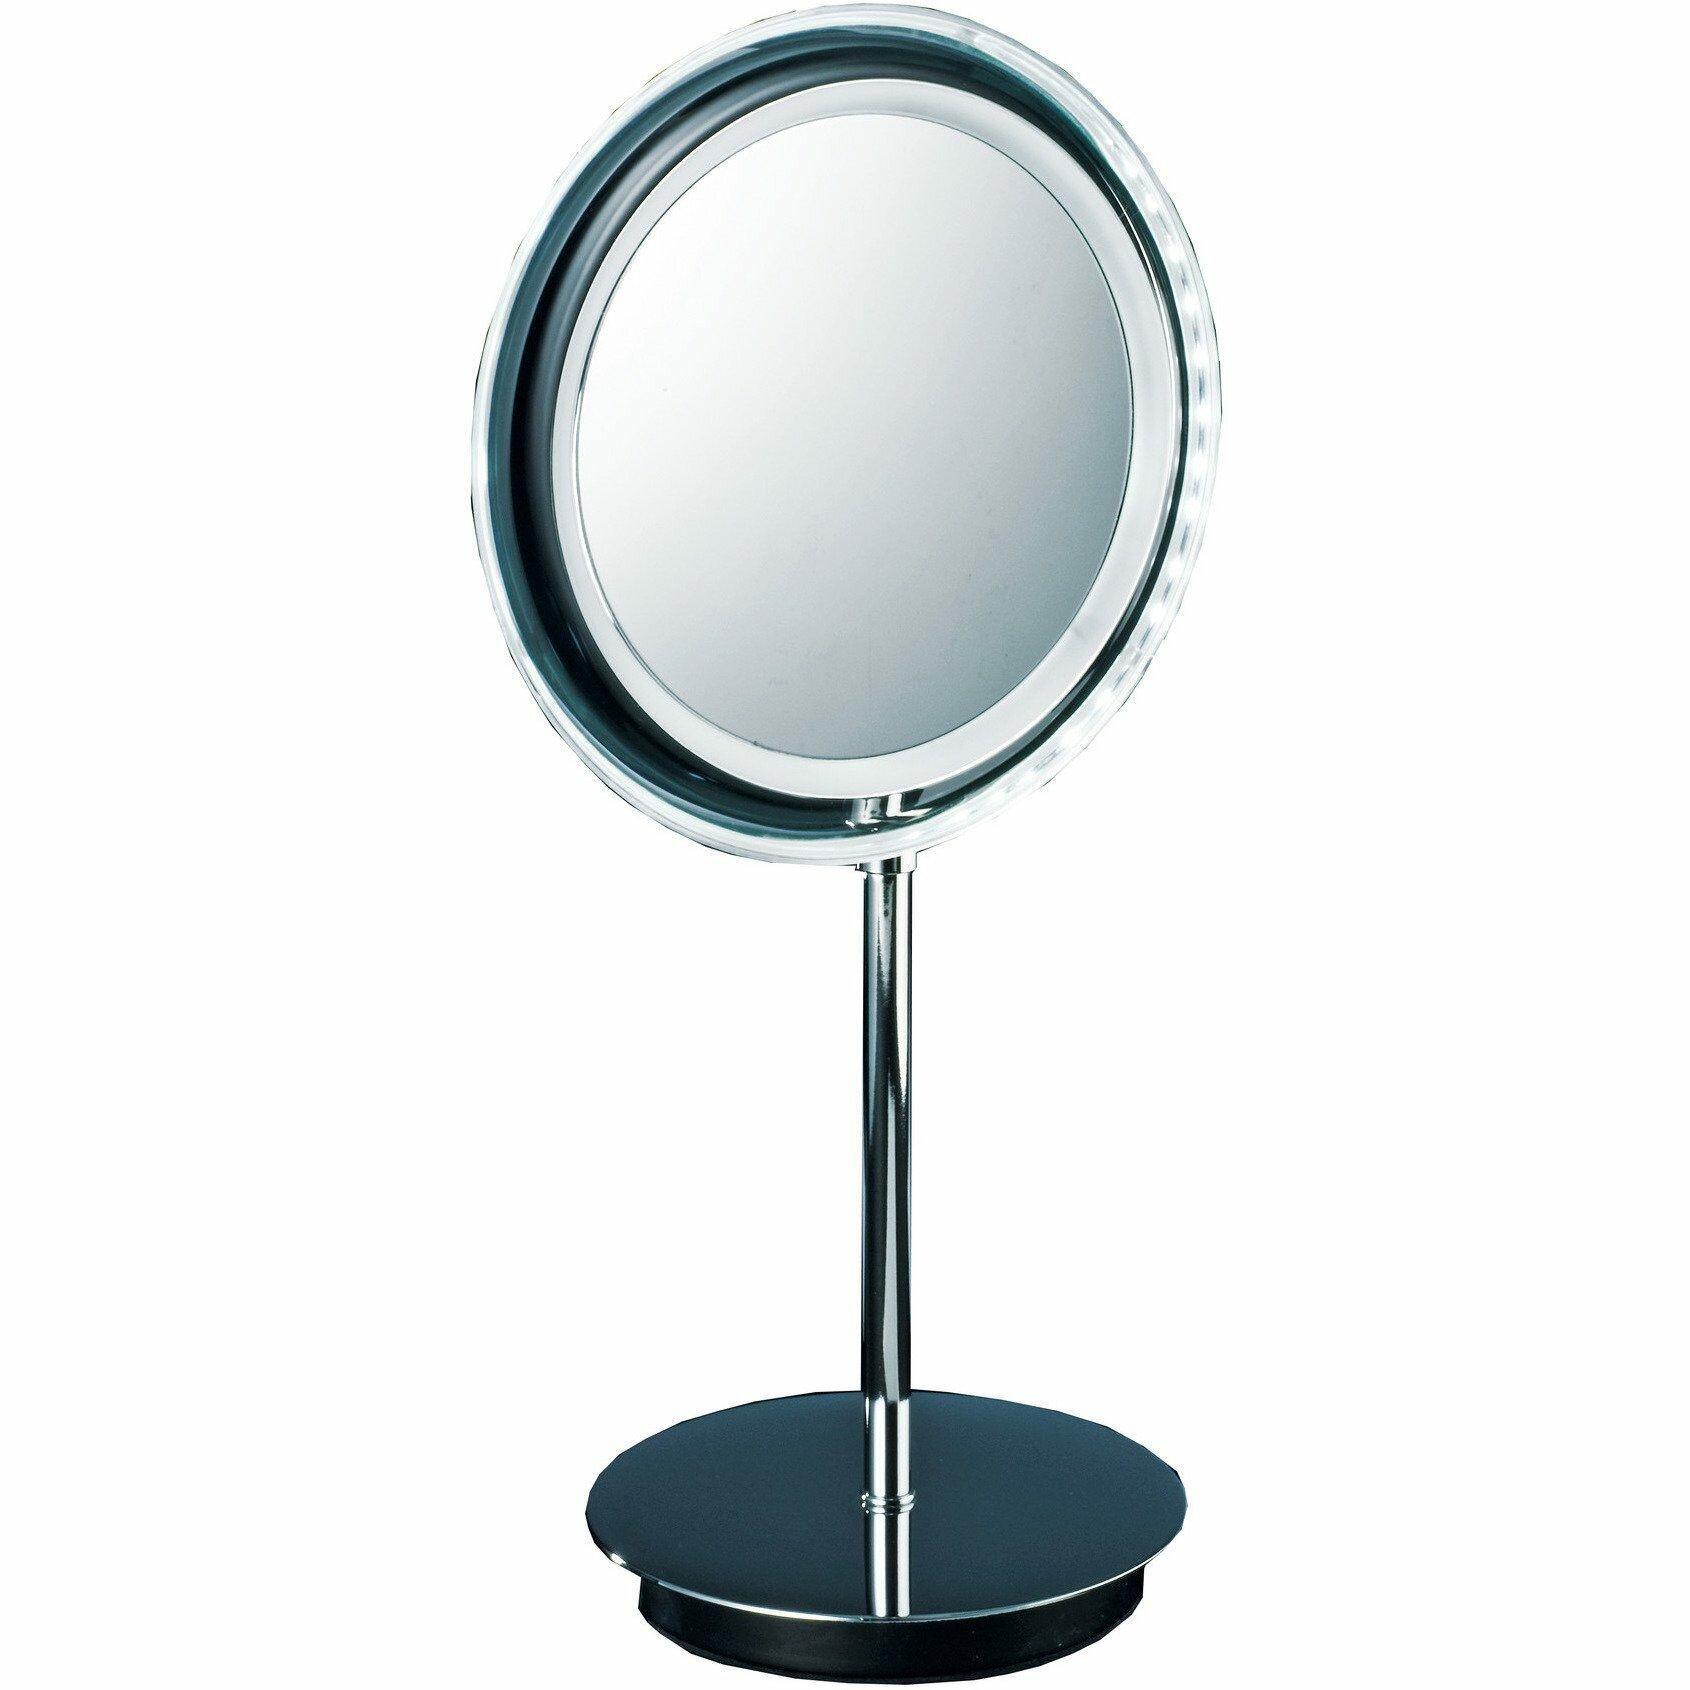 Symple Stuff Korman Round Led Makeup Shaving Mirror